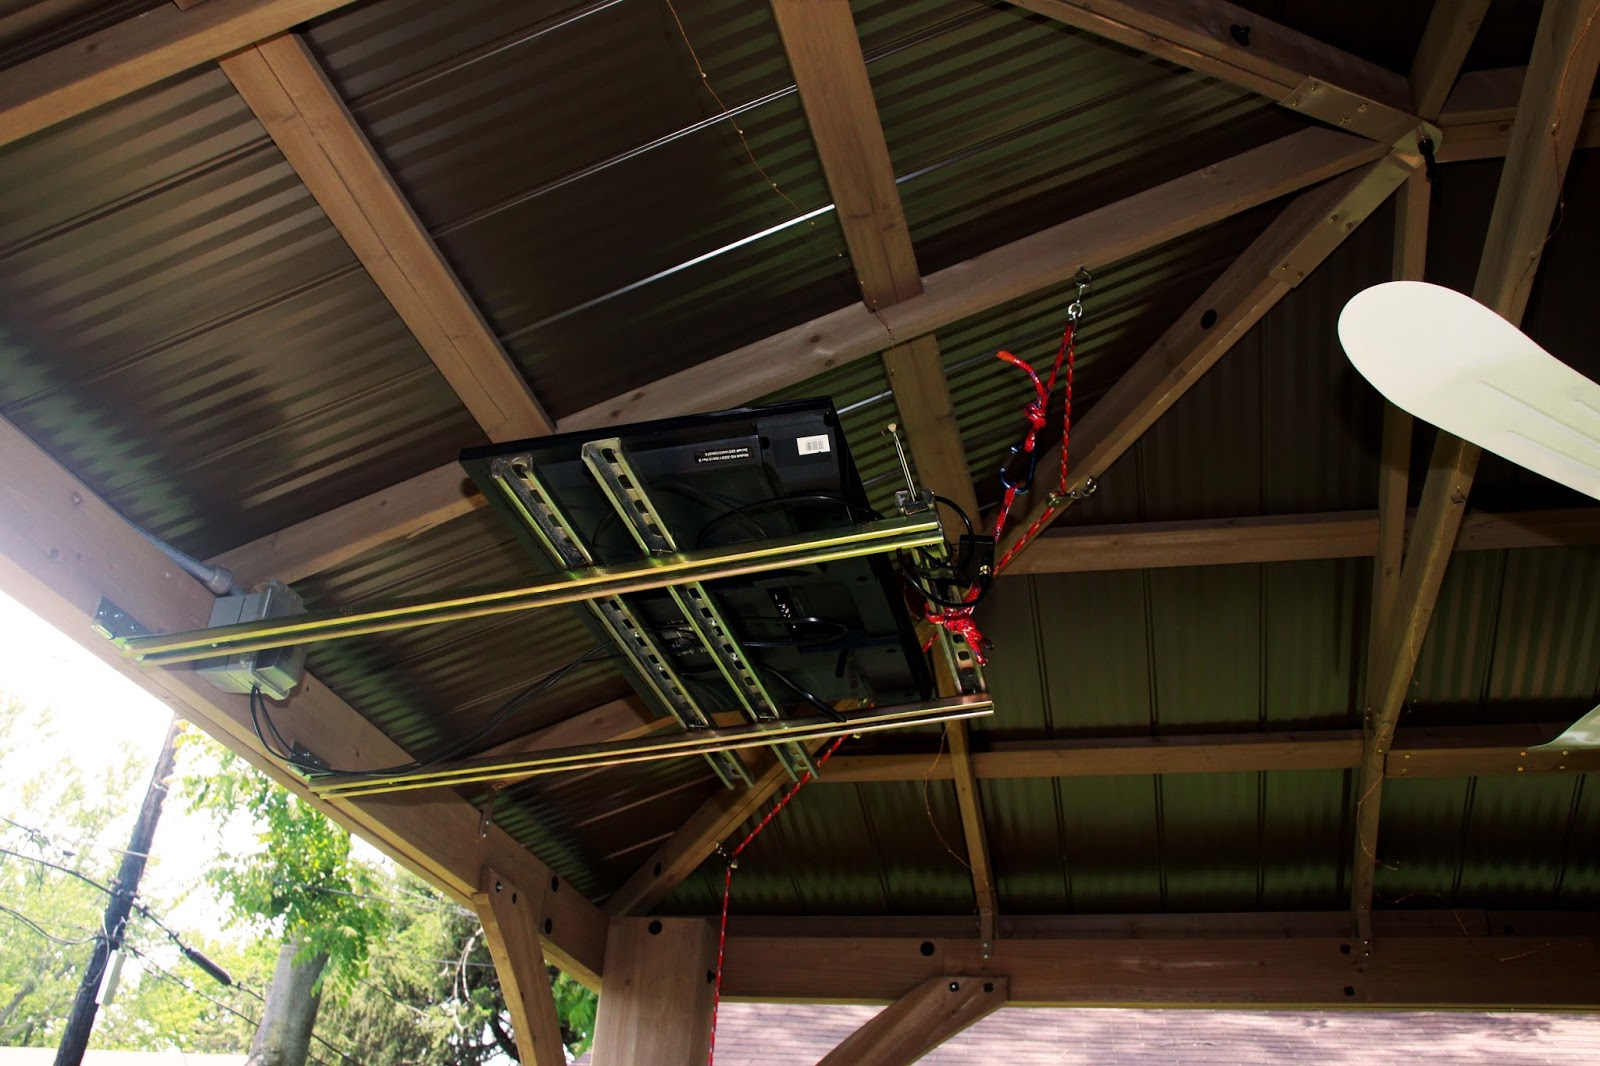 The Orange Door Diy Retractable System For A Tv In A Gazebo